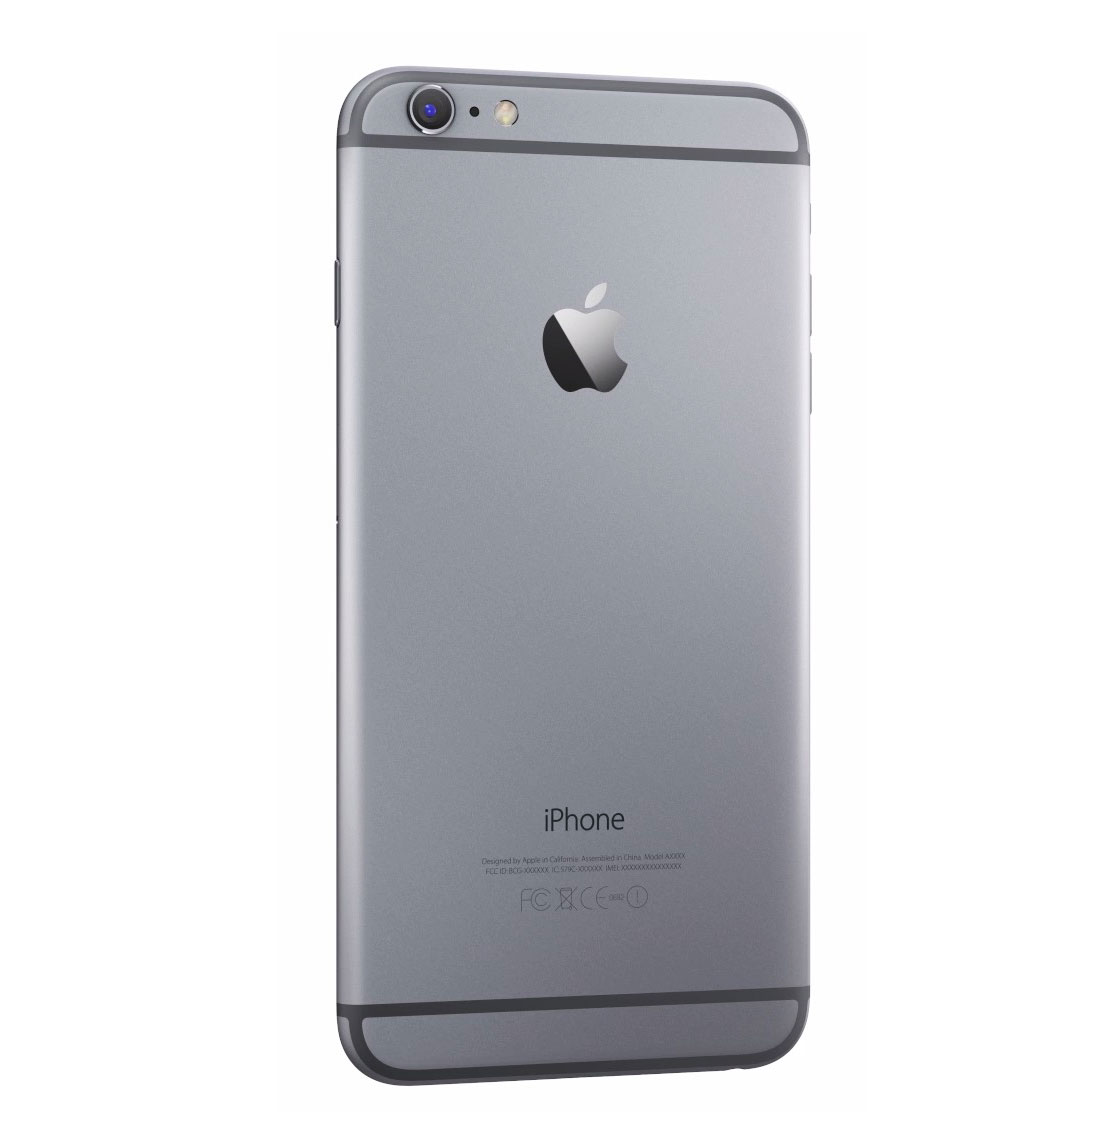 Apple Iphone 6 Space Grey 16Gb Price - PowerDNSSEC